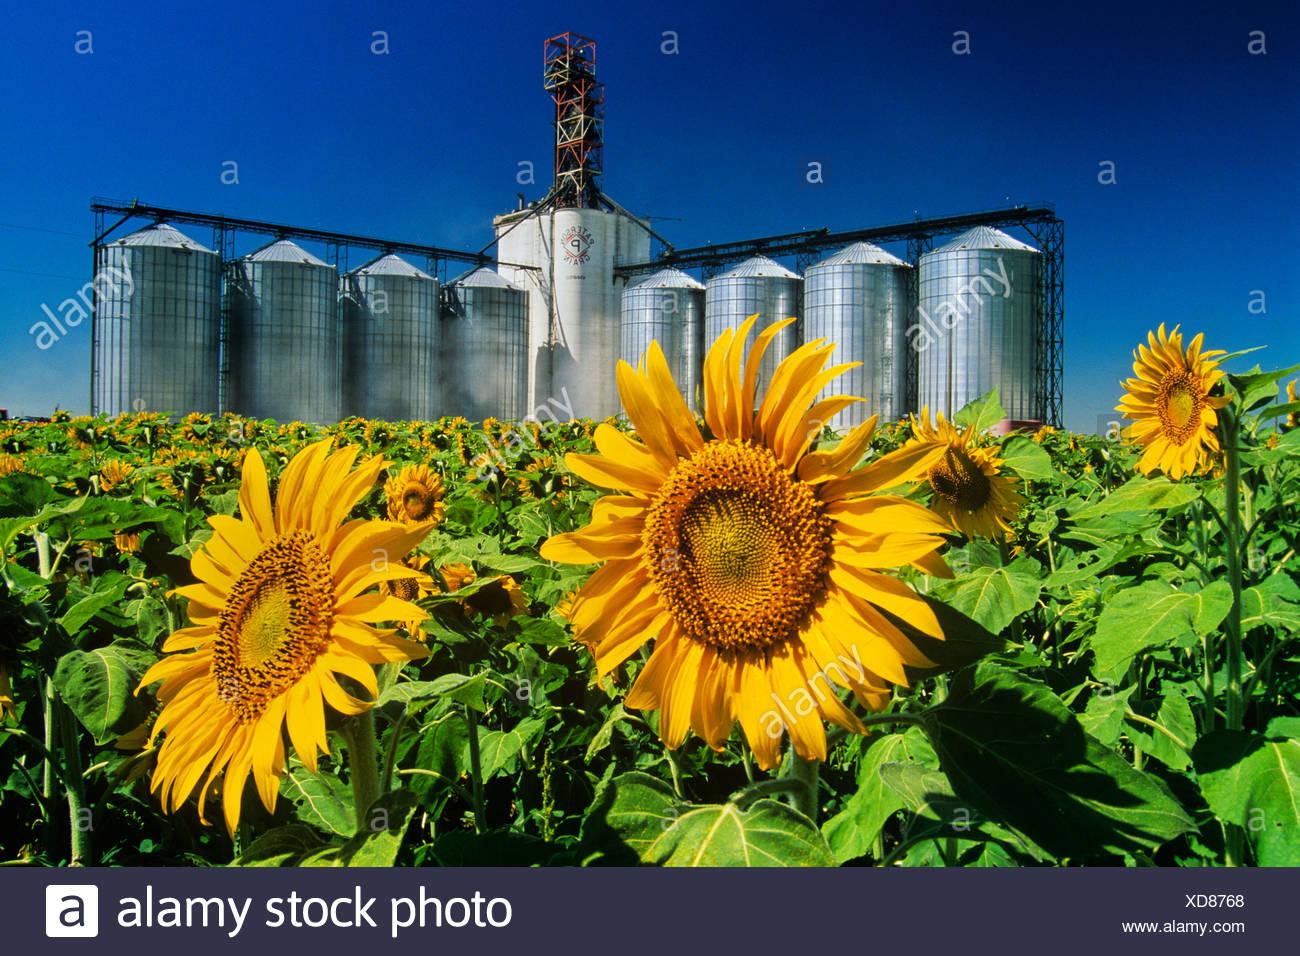 Sunflower (Helianthus annuus) field and inland grain terminal near Winnipeg, Manitoba, Canada - Stock Image